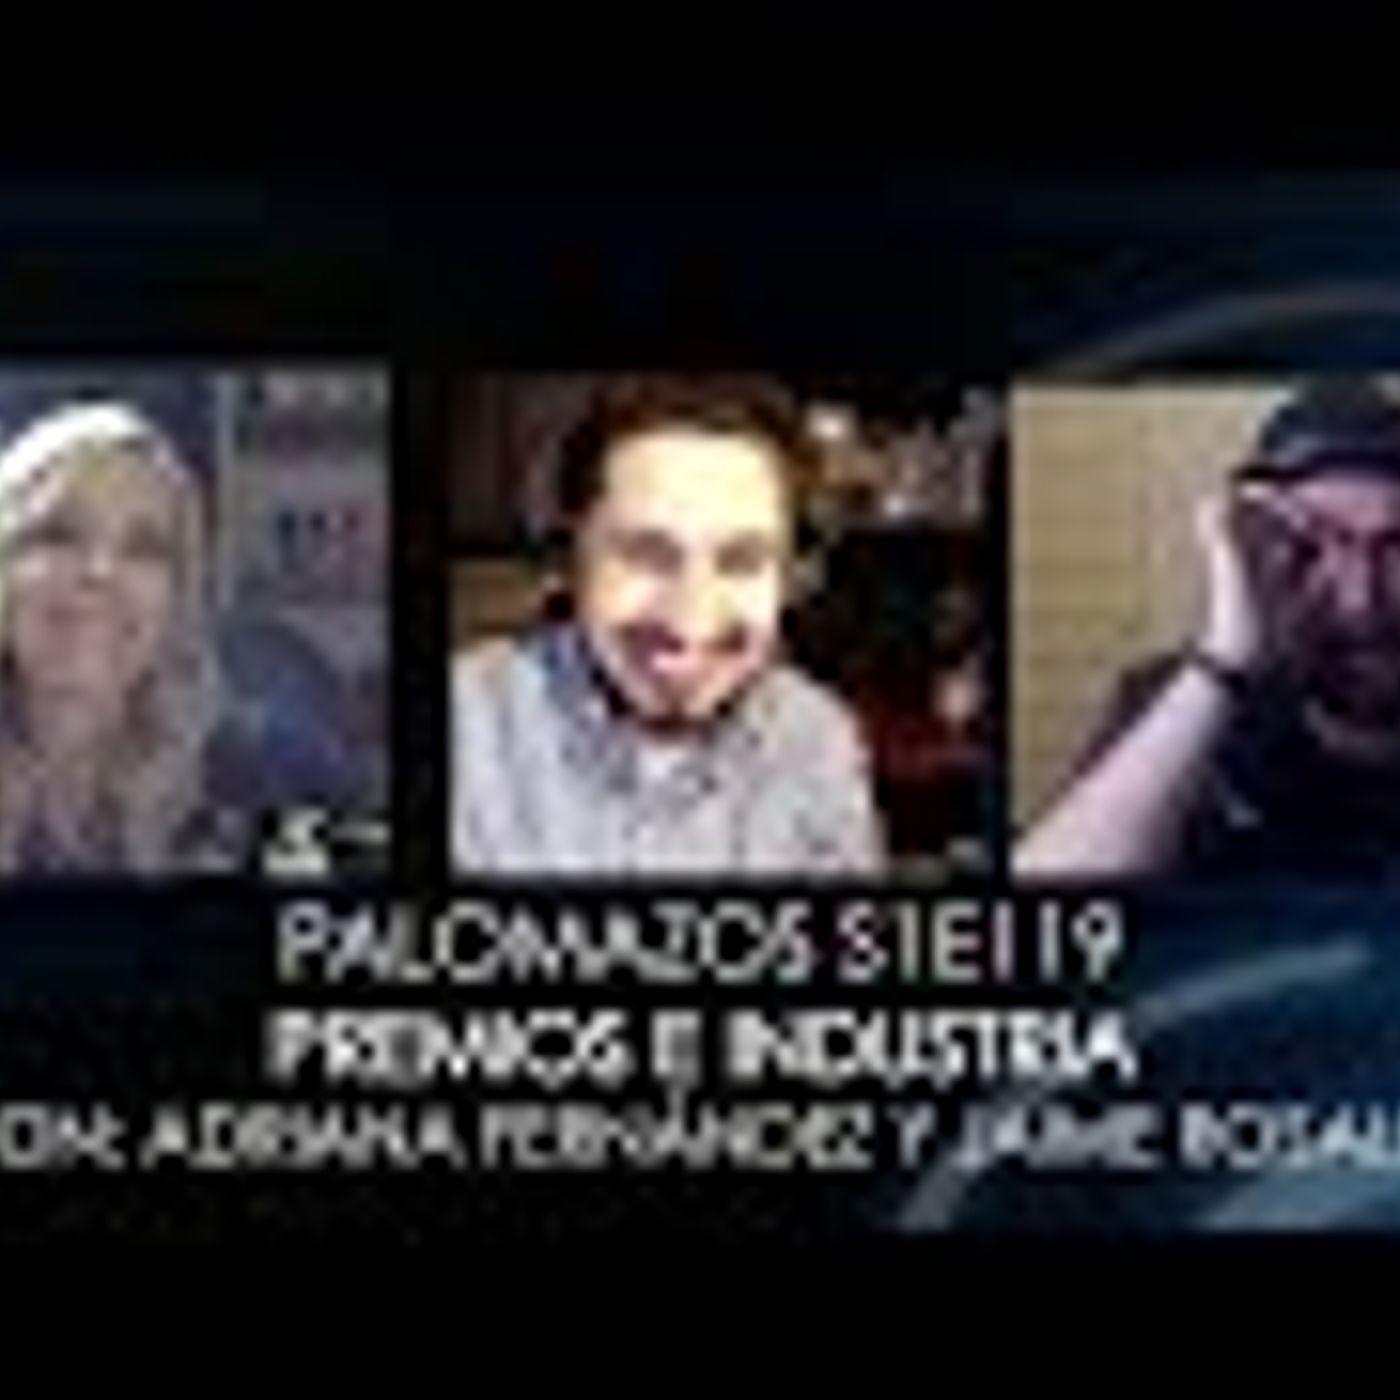 Palomazos S1E119 - Premios e Industria